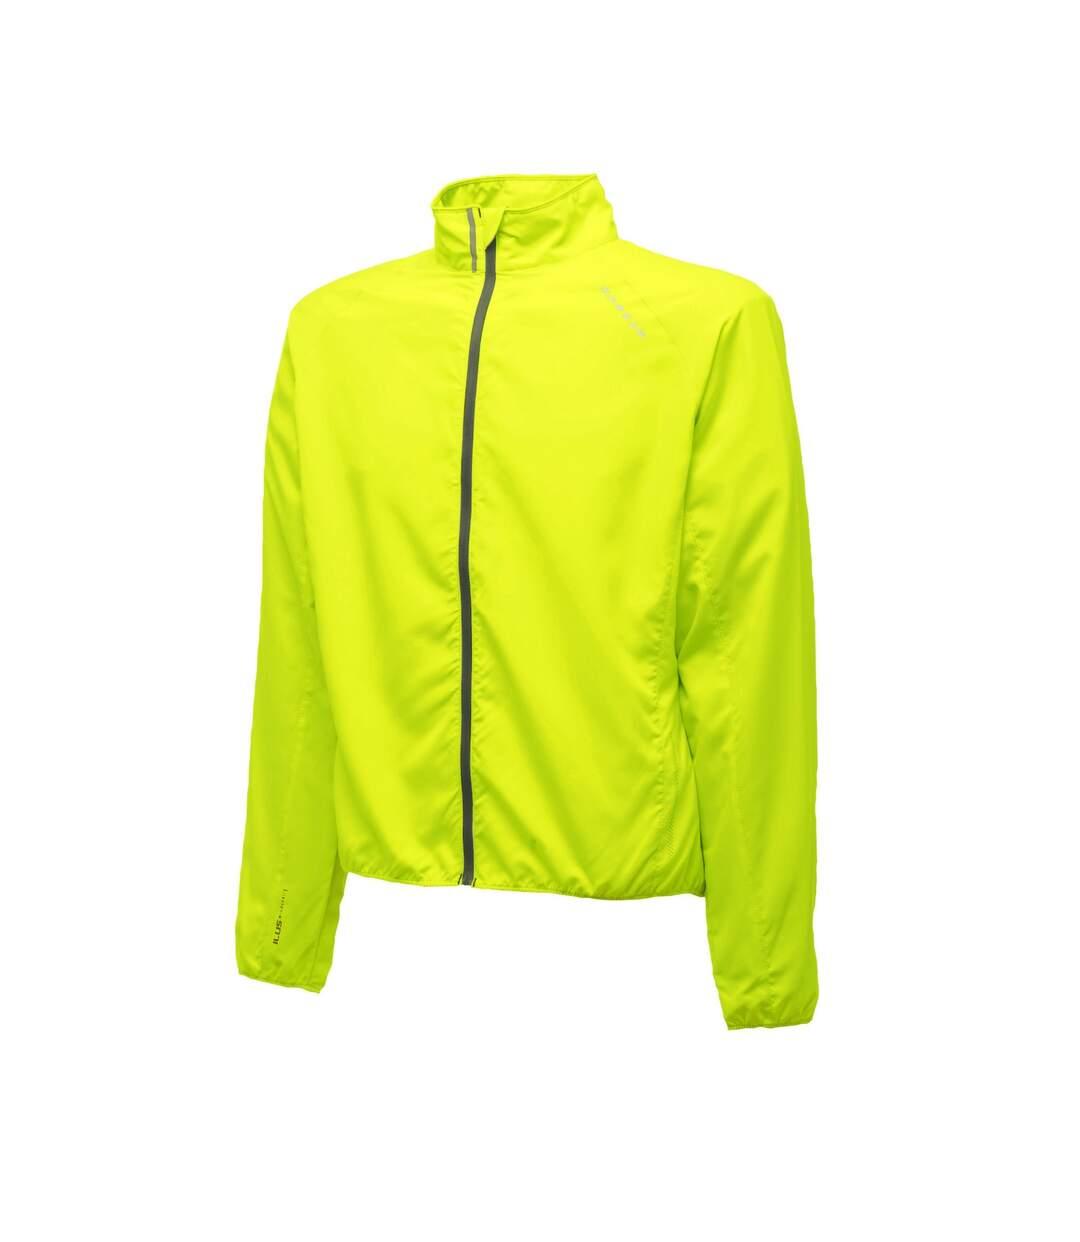 Dare 2B Mens Fired Up Lightweight Showerproof Windshell Jacket (Fluro Yellow) - UTRG223